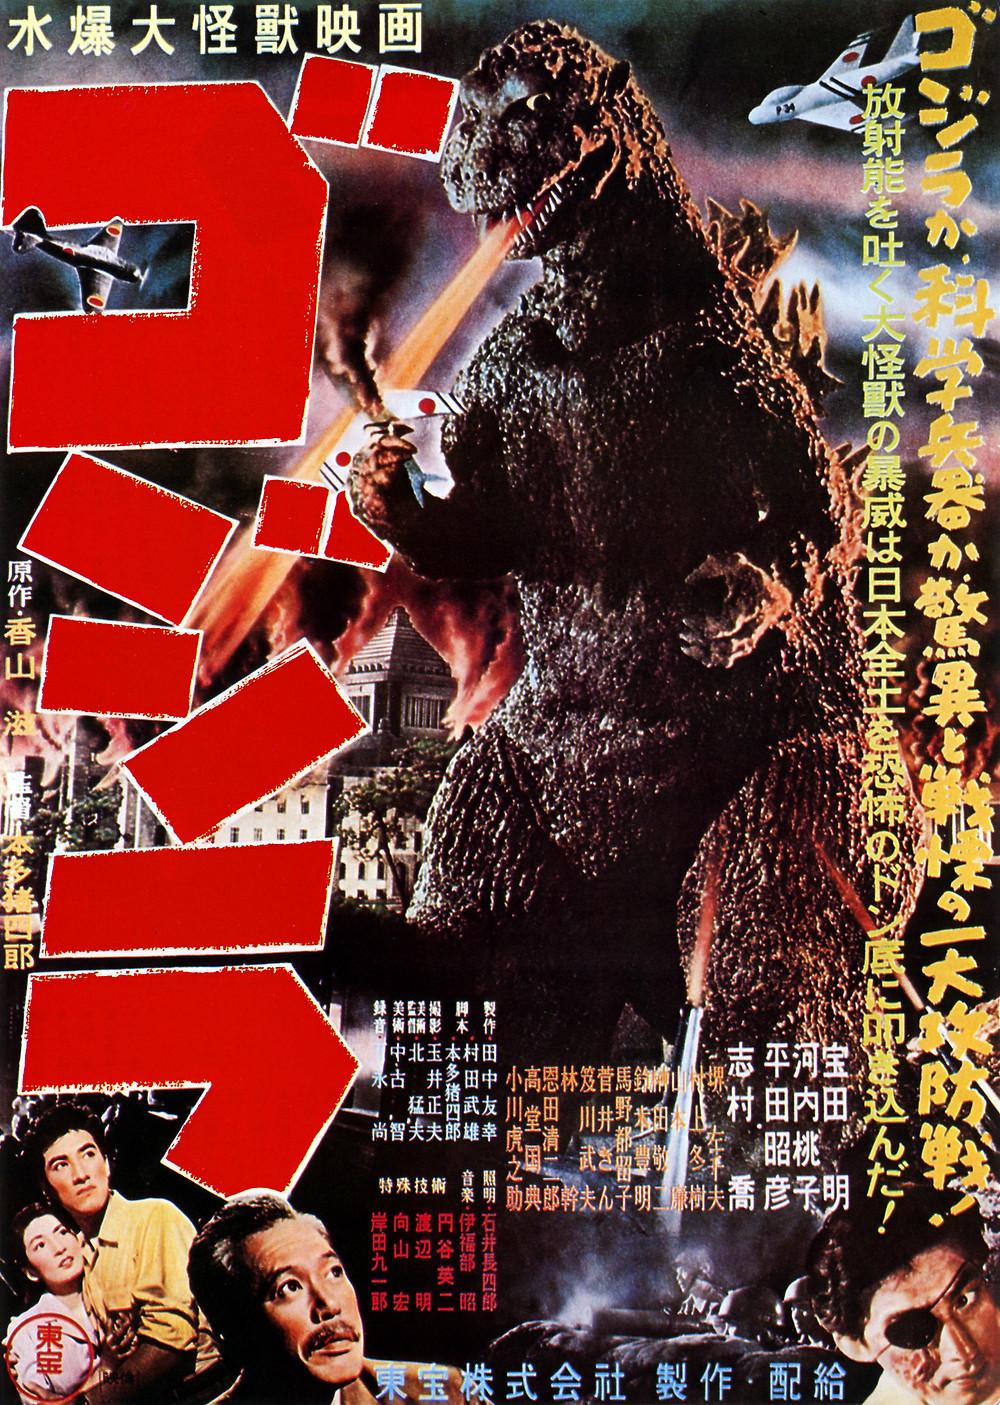 Godzilla, Public Domain, 1954.